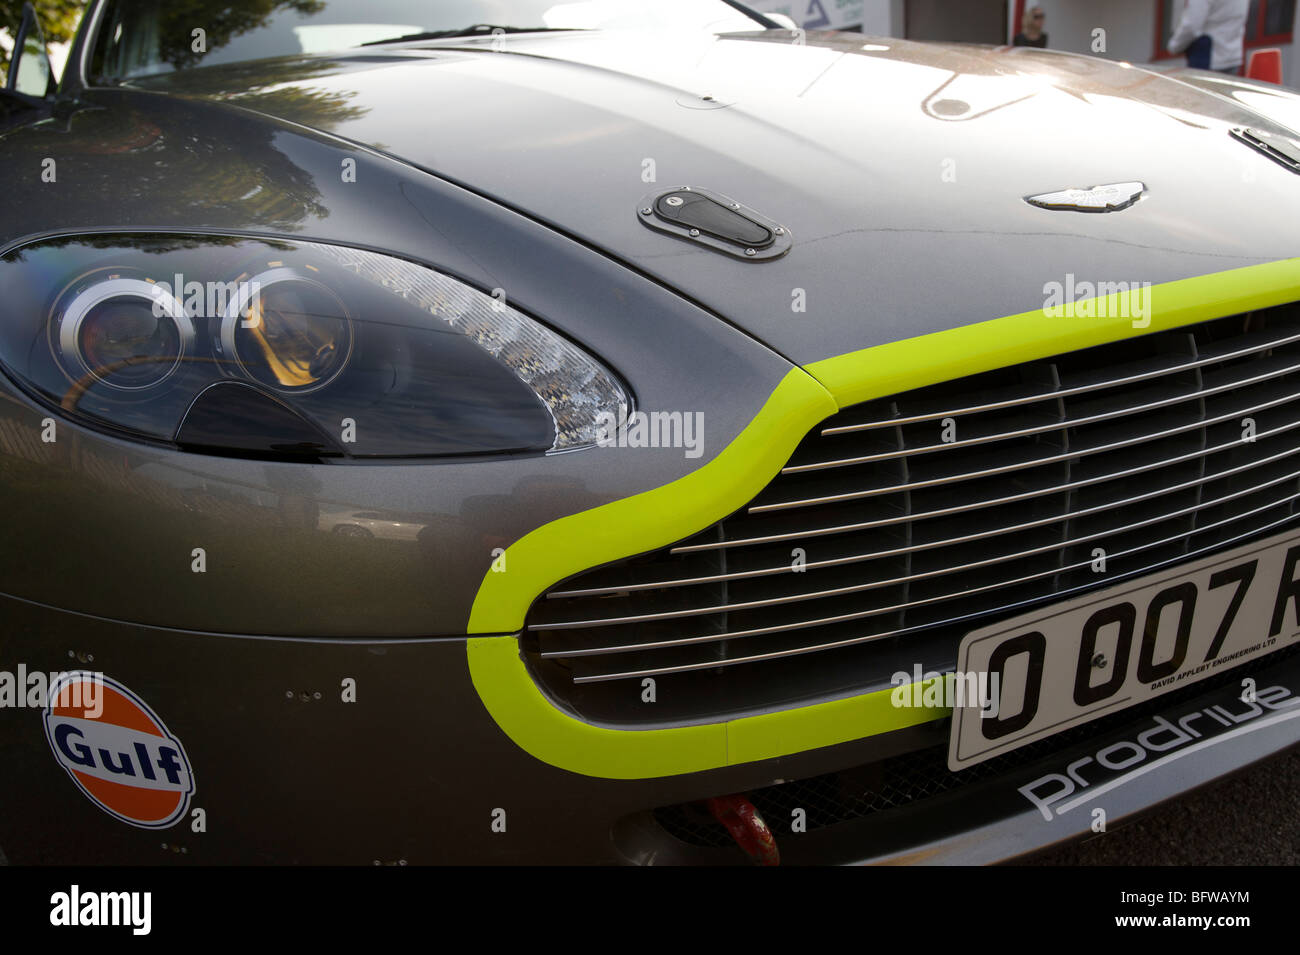 Aston Martin DB9 Rally Car prodrive - Stock Image